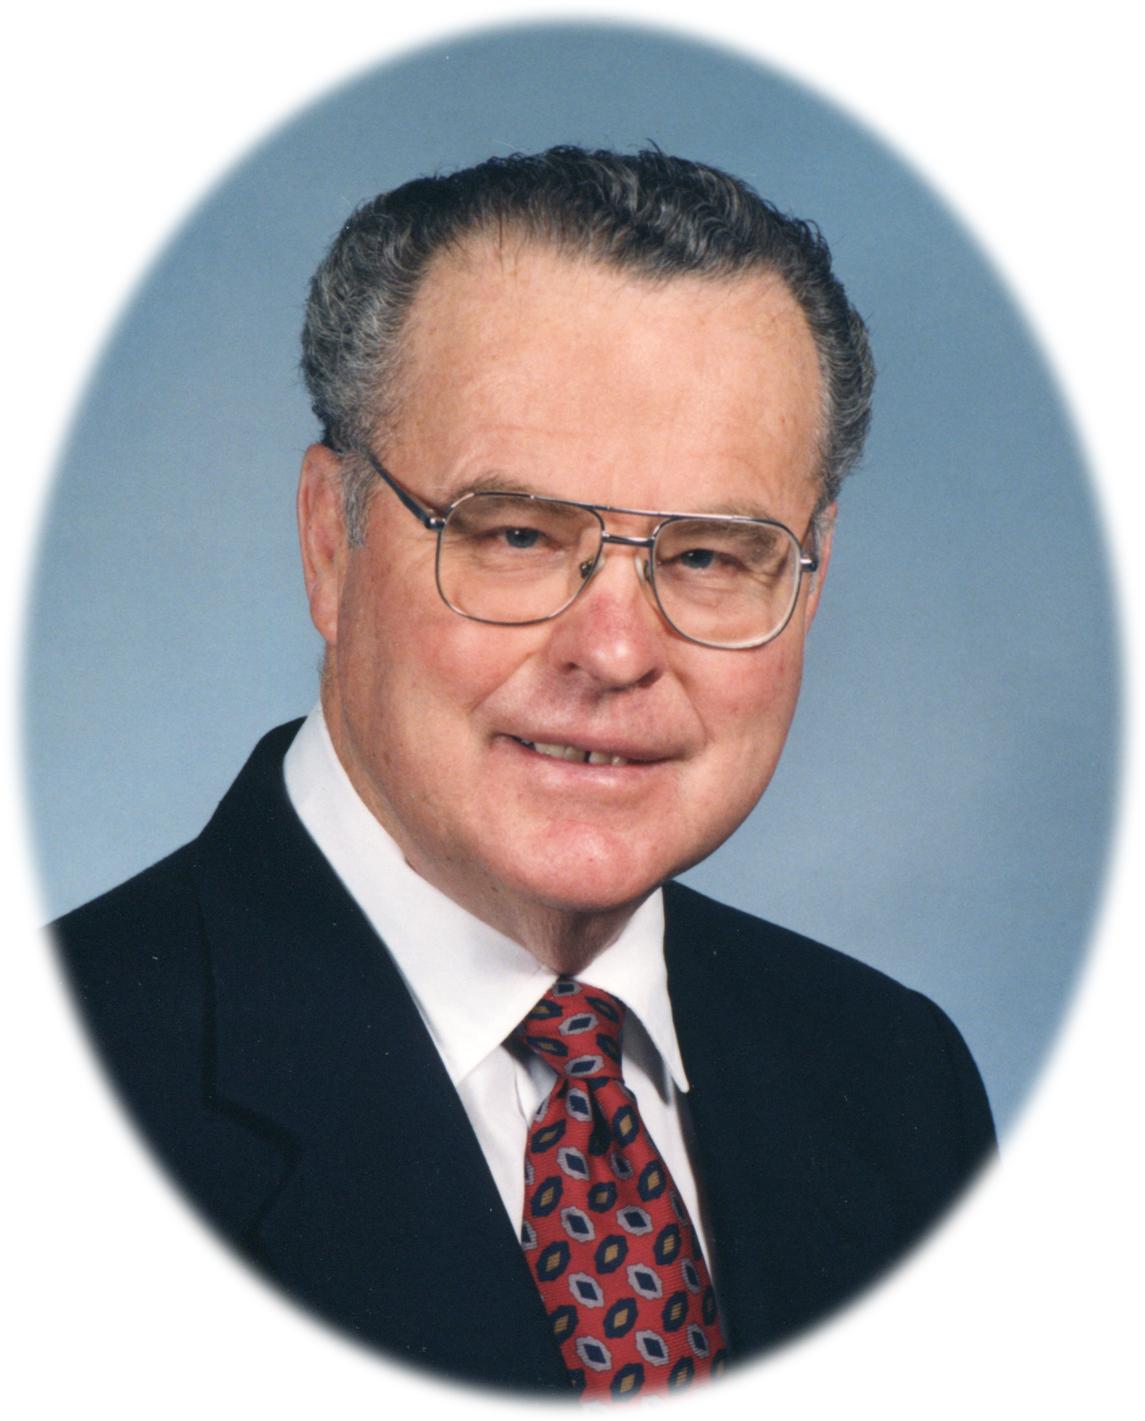 James R. Marne